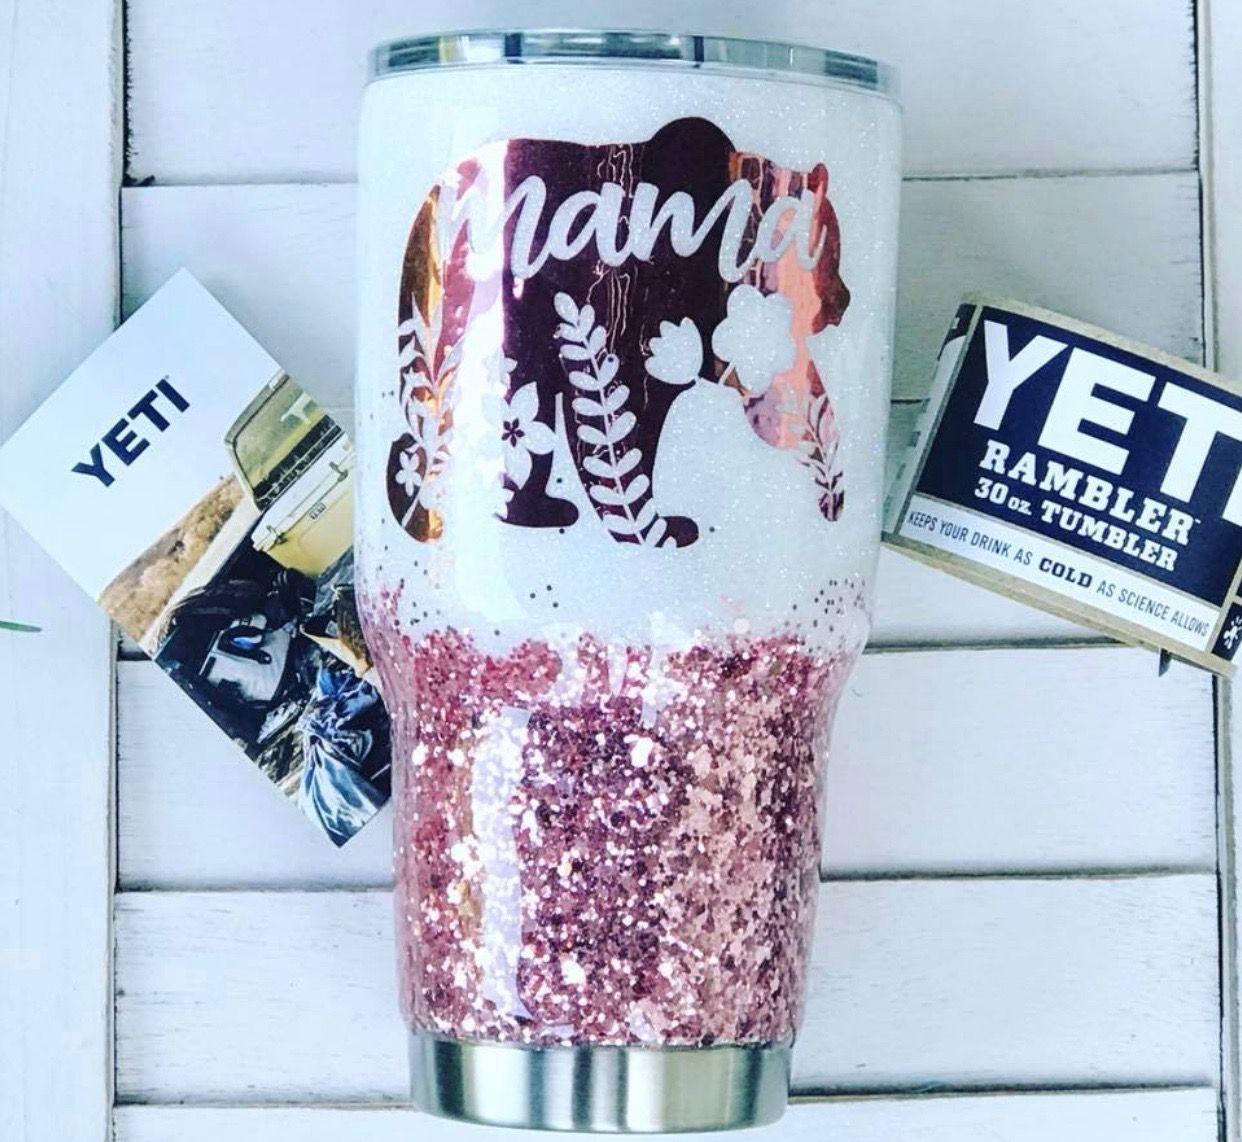 Glitter Tumbler Stainless Steel,Personalized Gifts,Teacher Gift,Custom Tumbler,Gifts for Her Mama Bear Glittered Tumbler